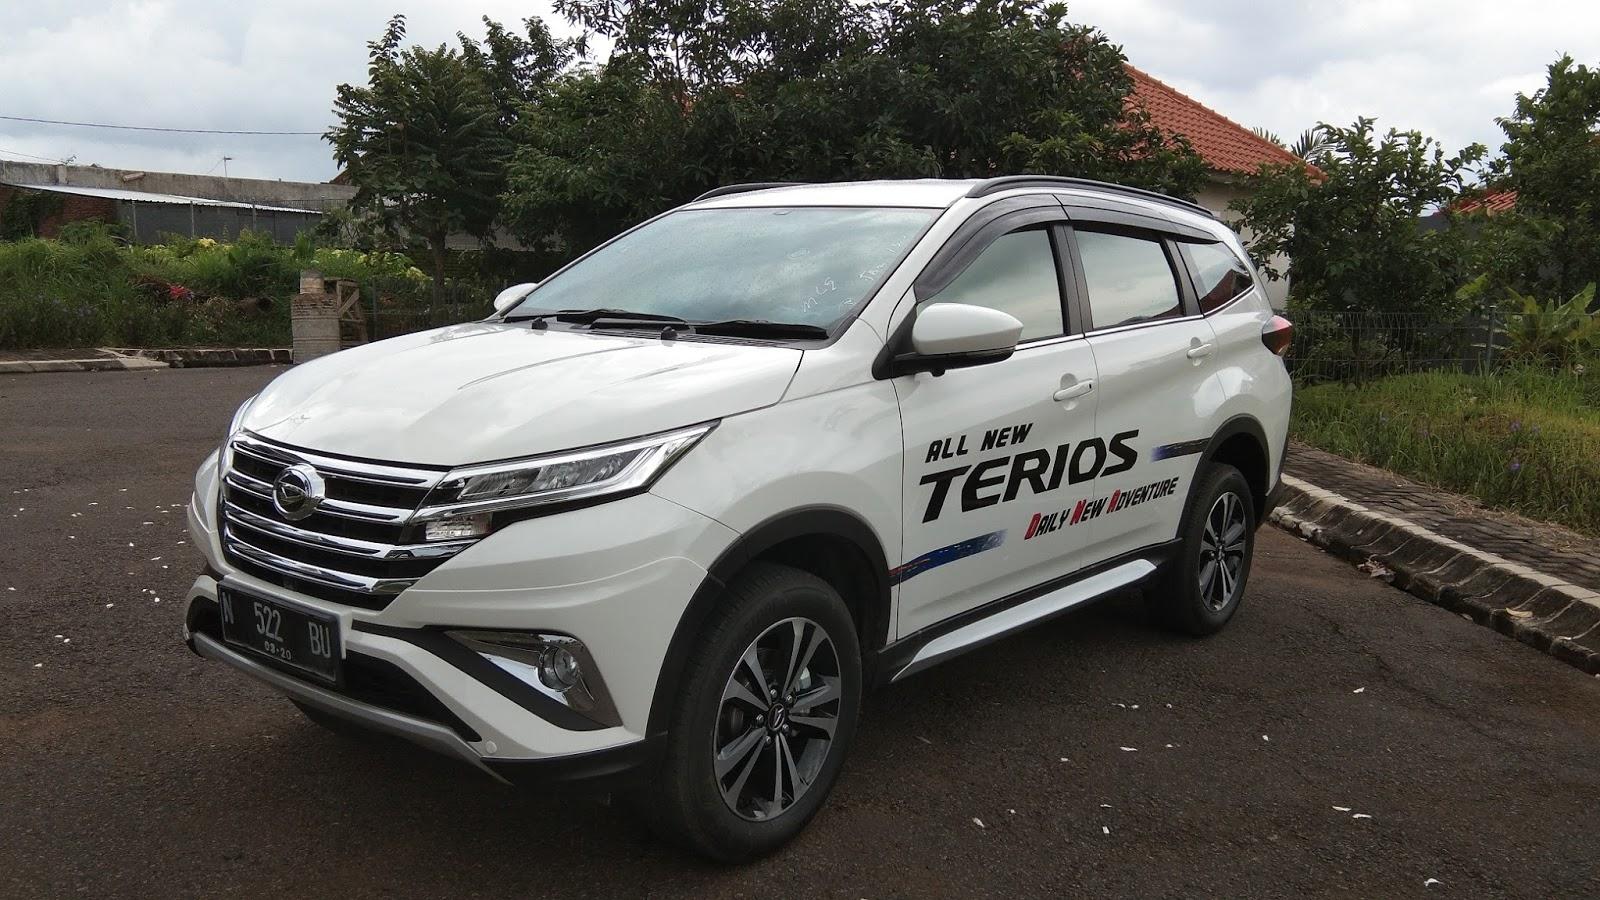 Harga Daihatsu Terios Model Baru Tak Alami Kenaikan, Ini ...